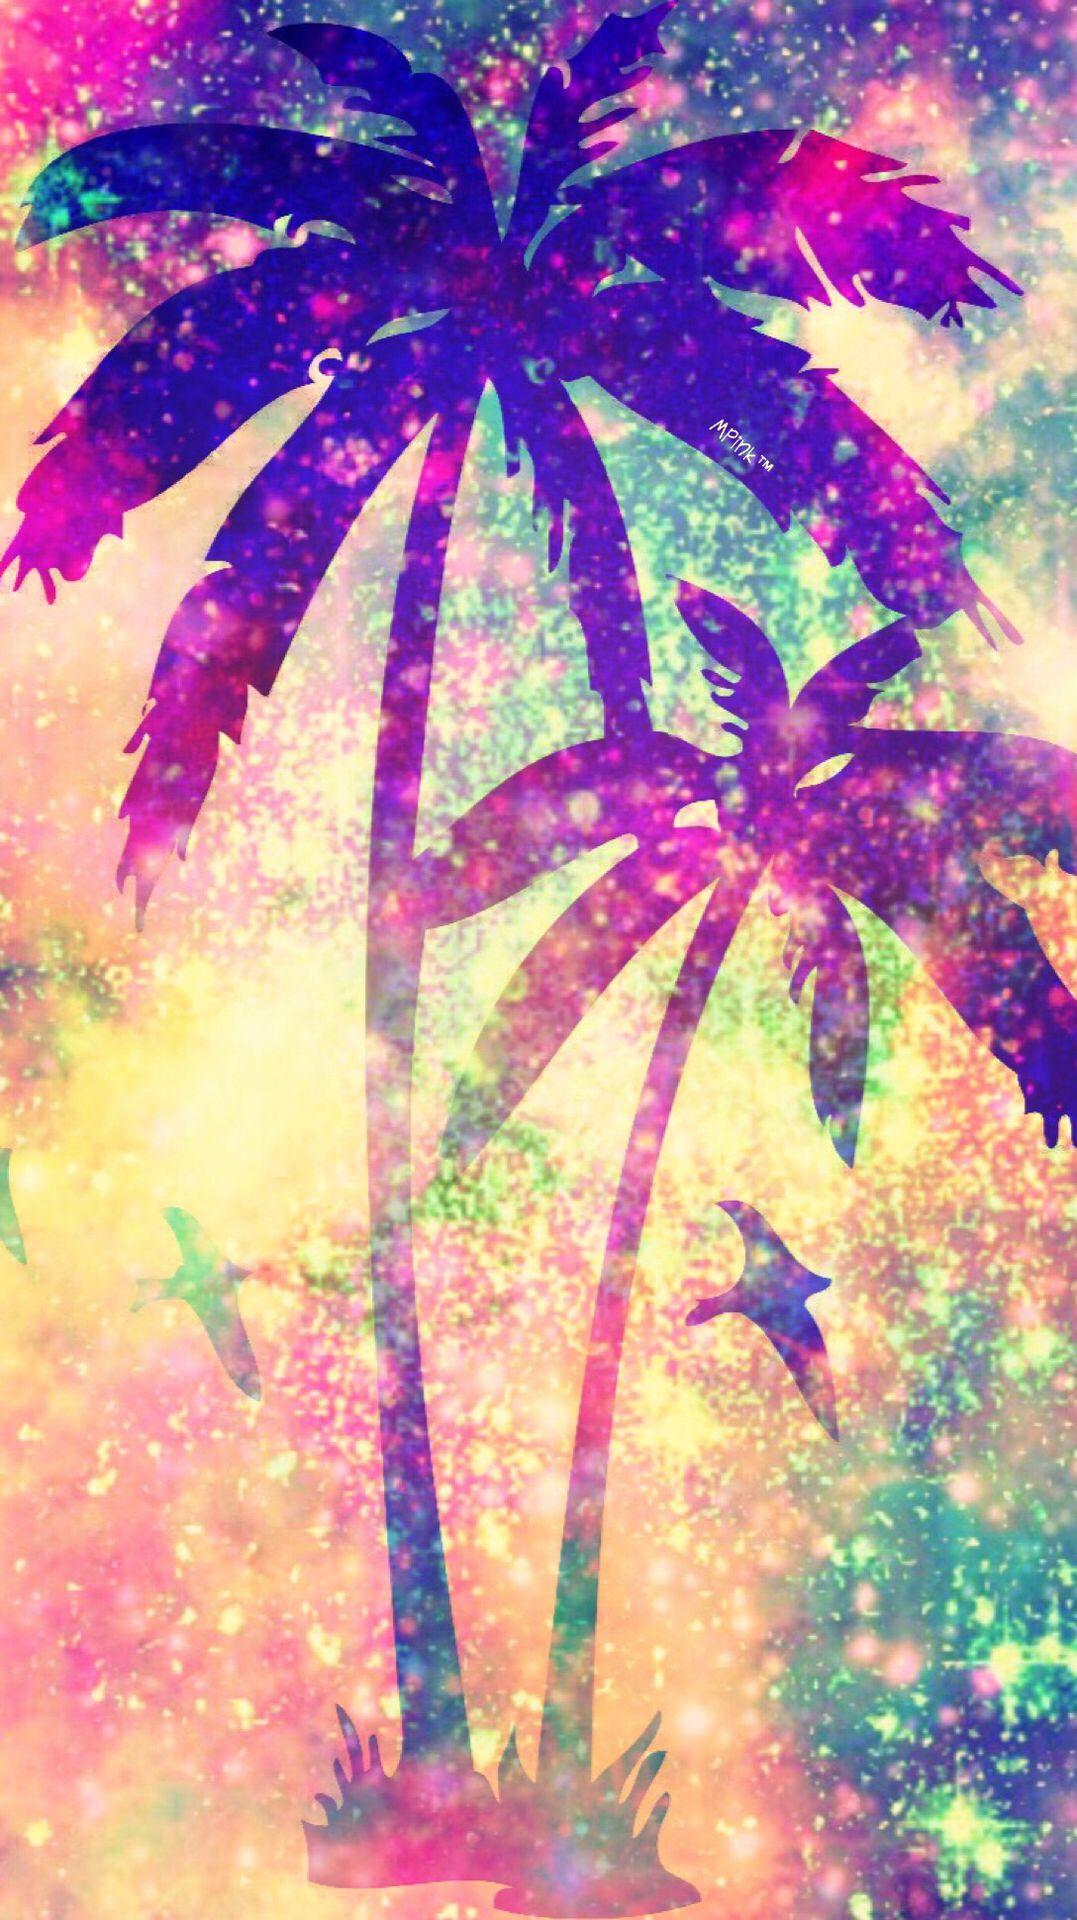 Galaxy Palm Trees Wallpaper | Screen savers wallpapers ...